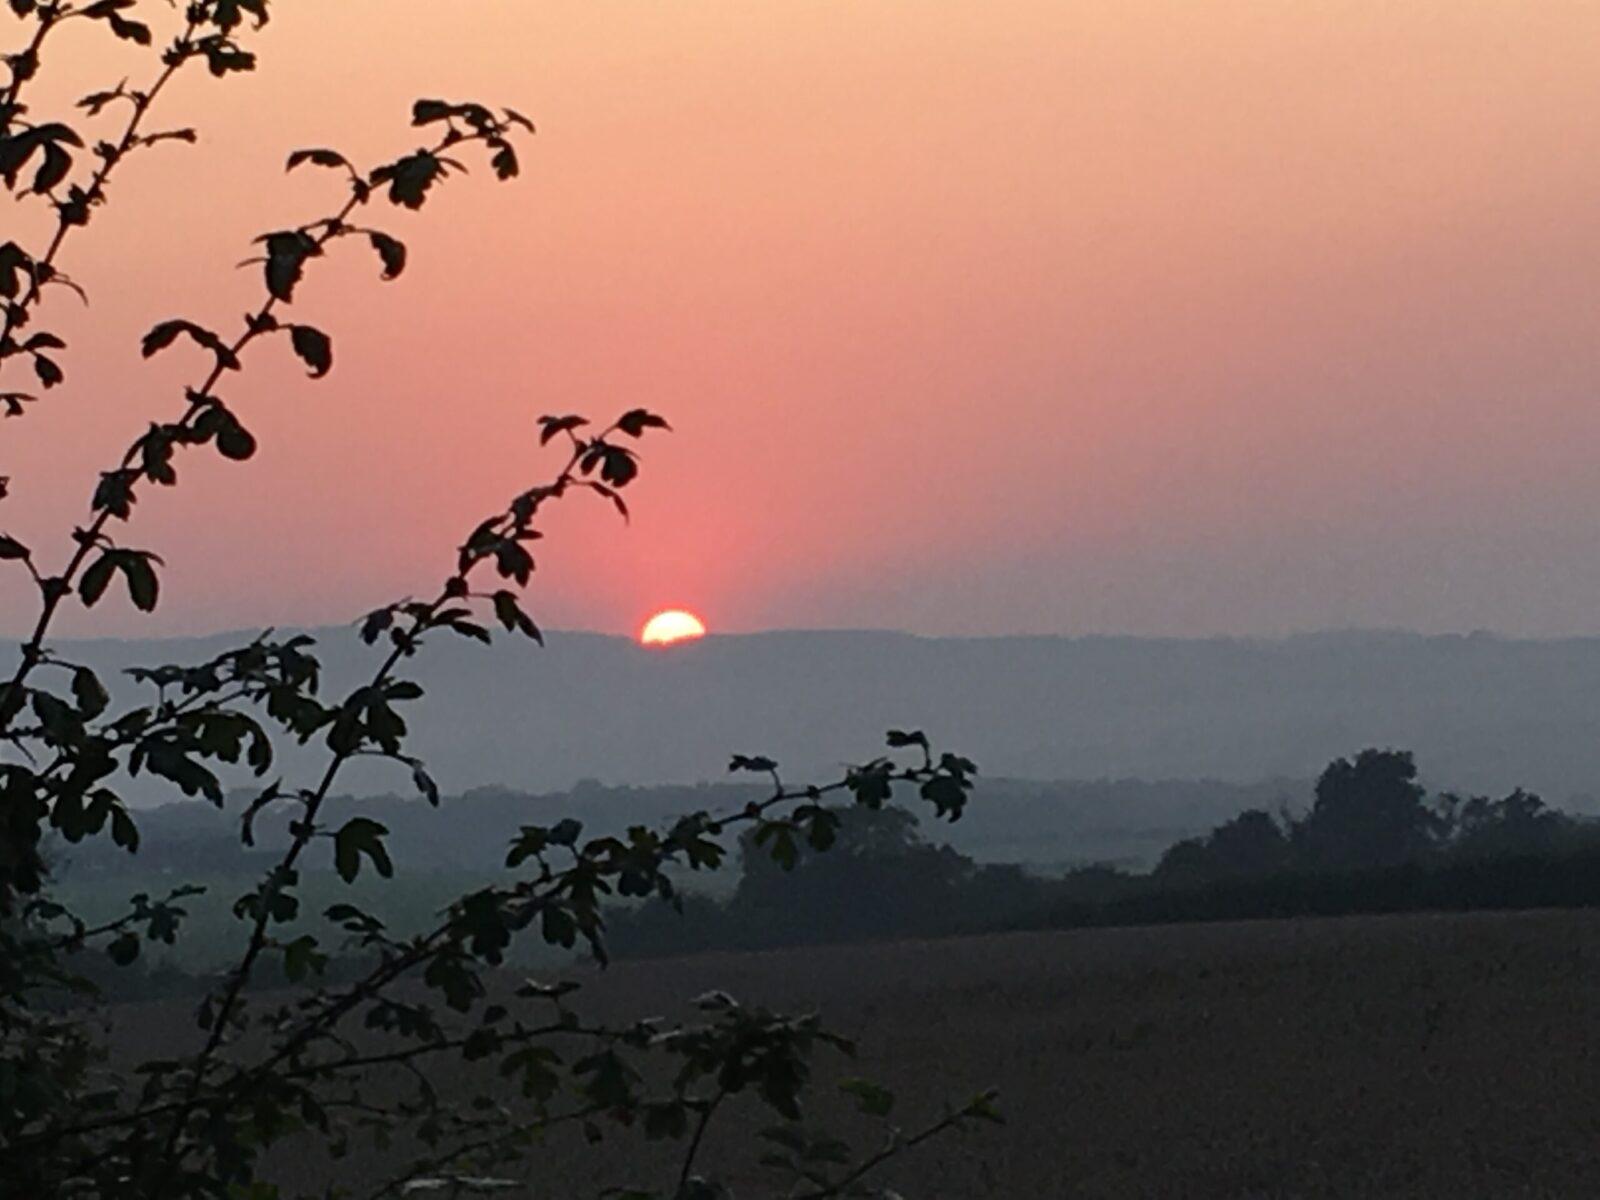 Sun setting over the North York Moors.